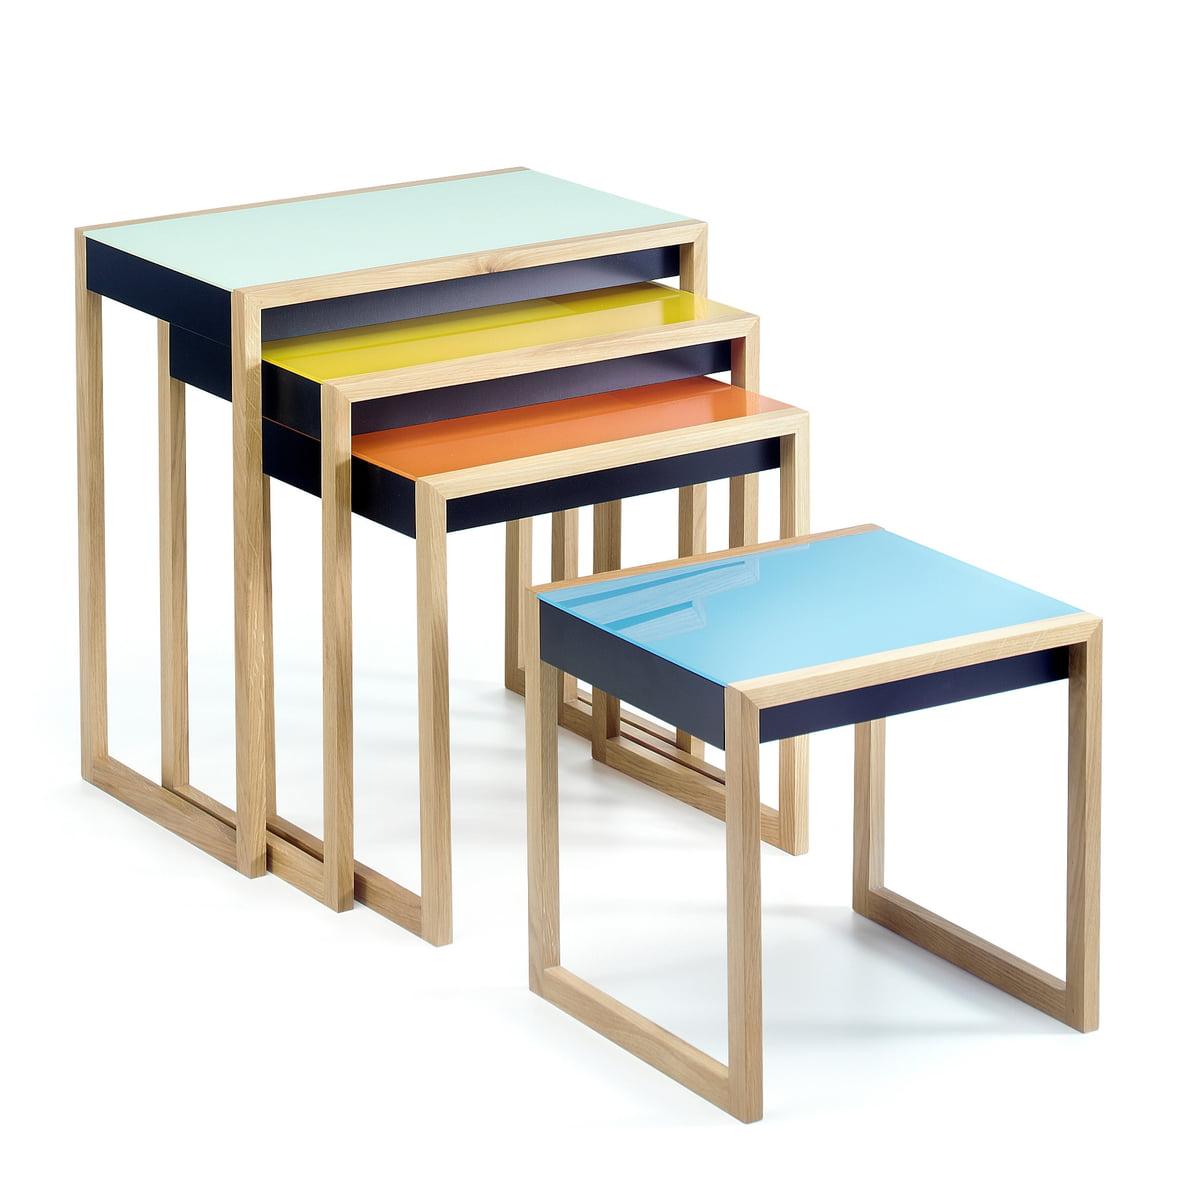 Nesting tables by josef albers connox josef albers nesting tables set of 4 tables watchthetrailerfo